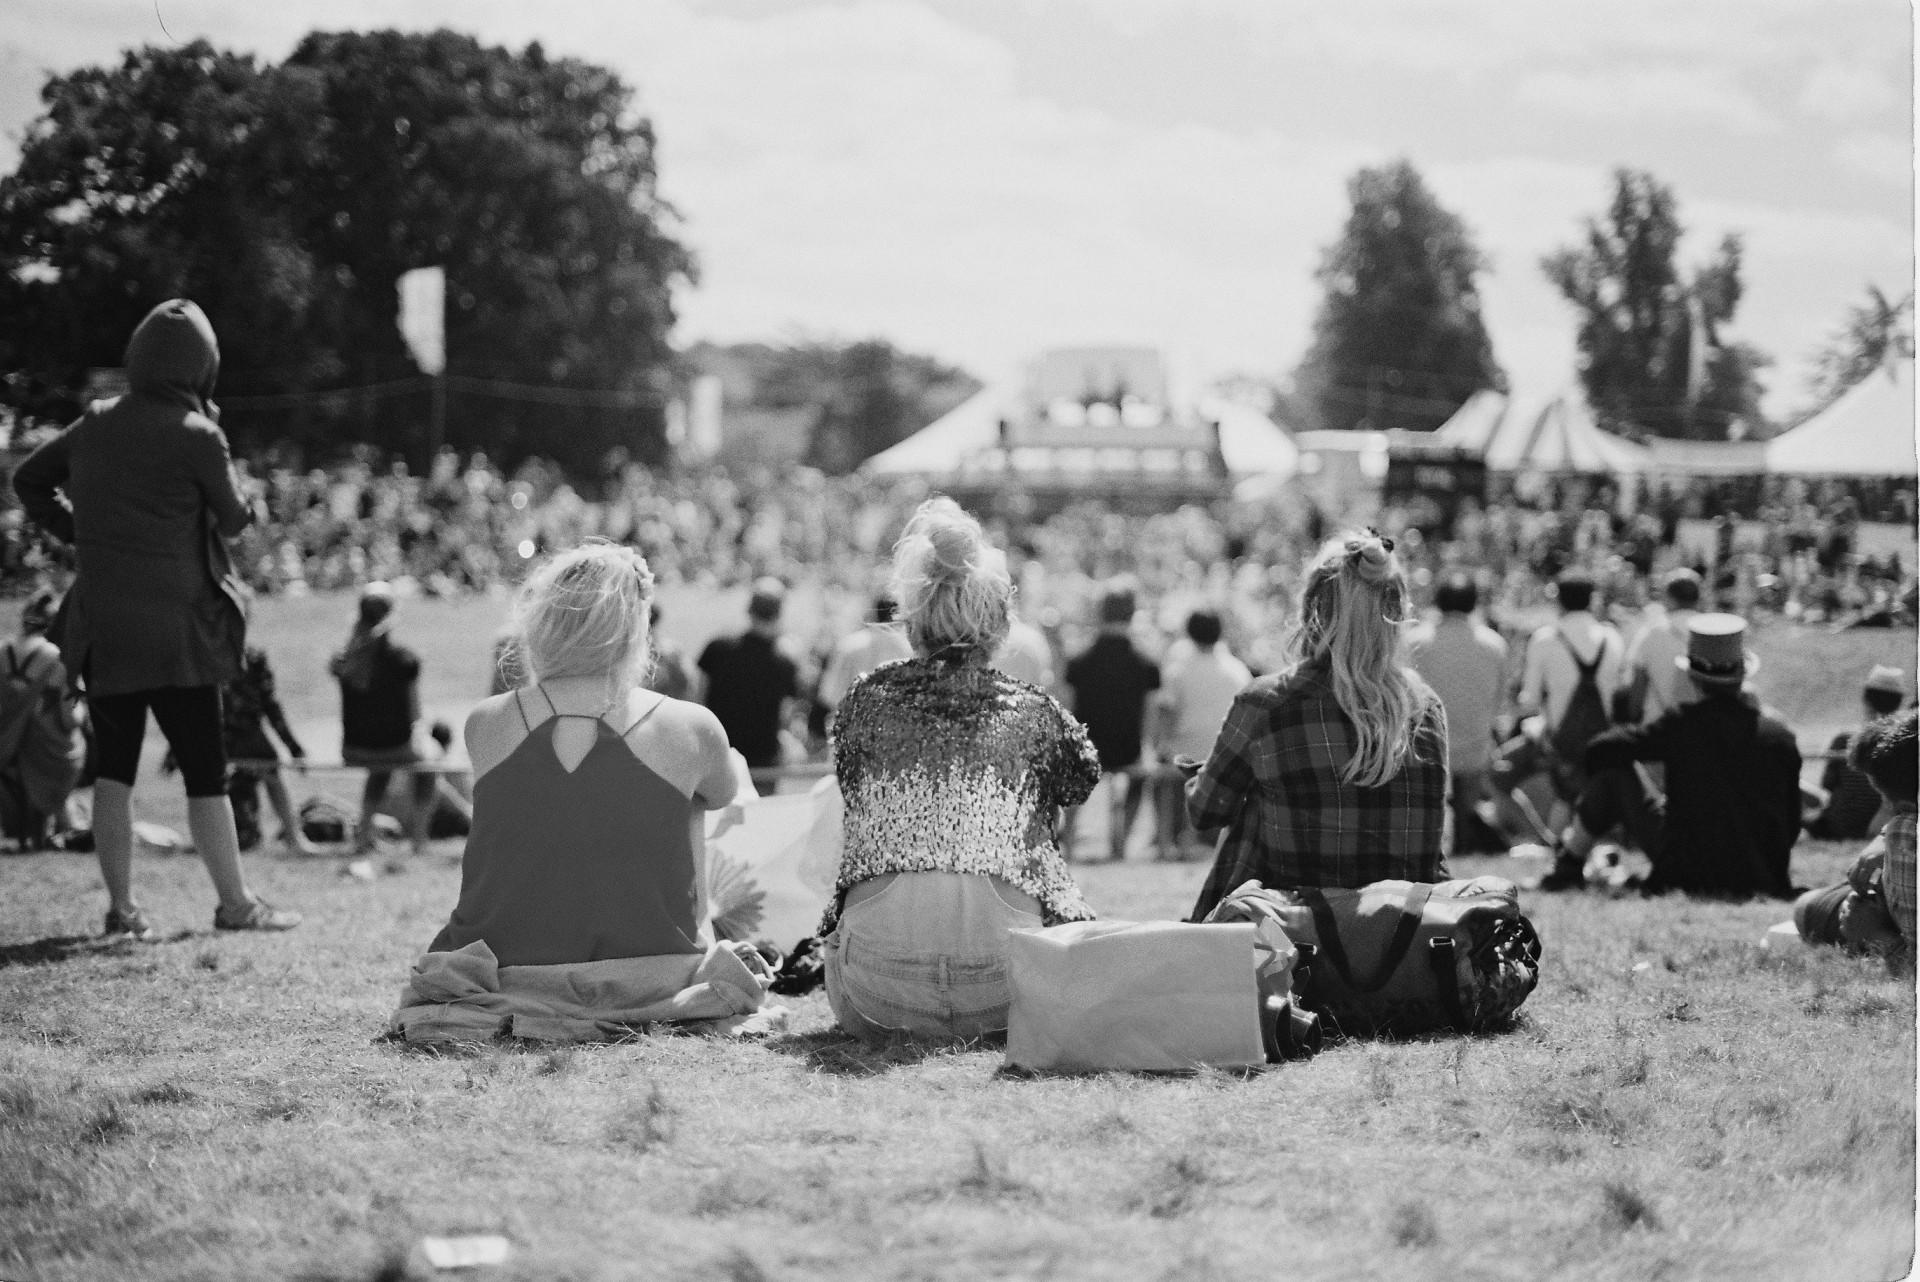 Emisys Festival App